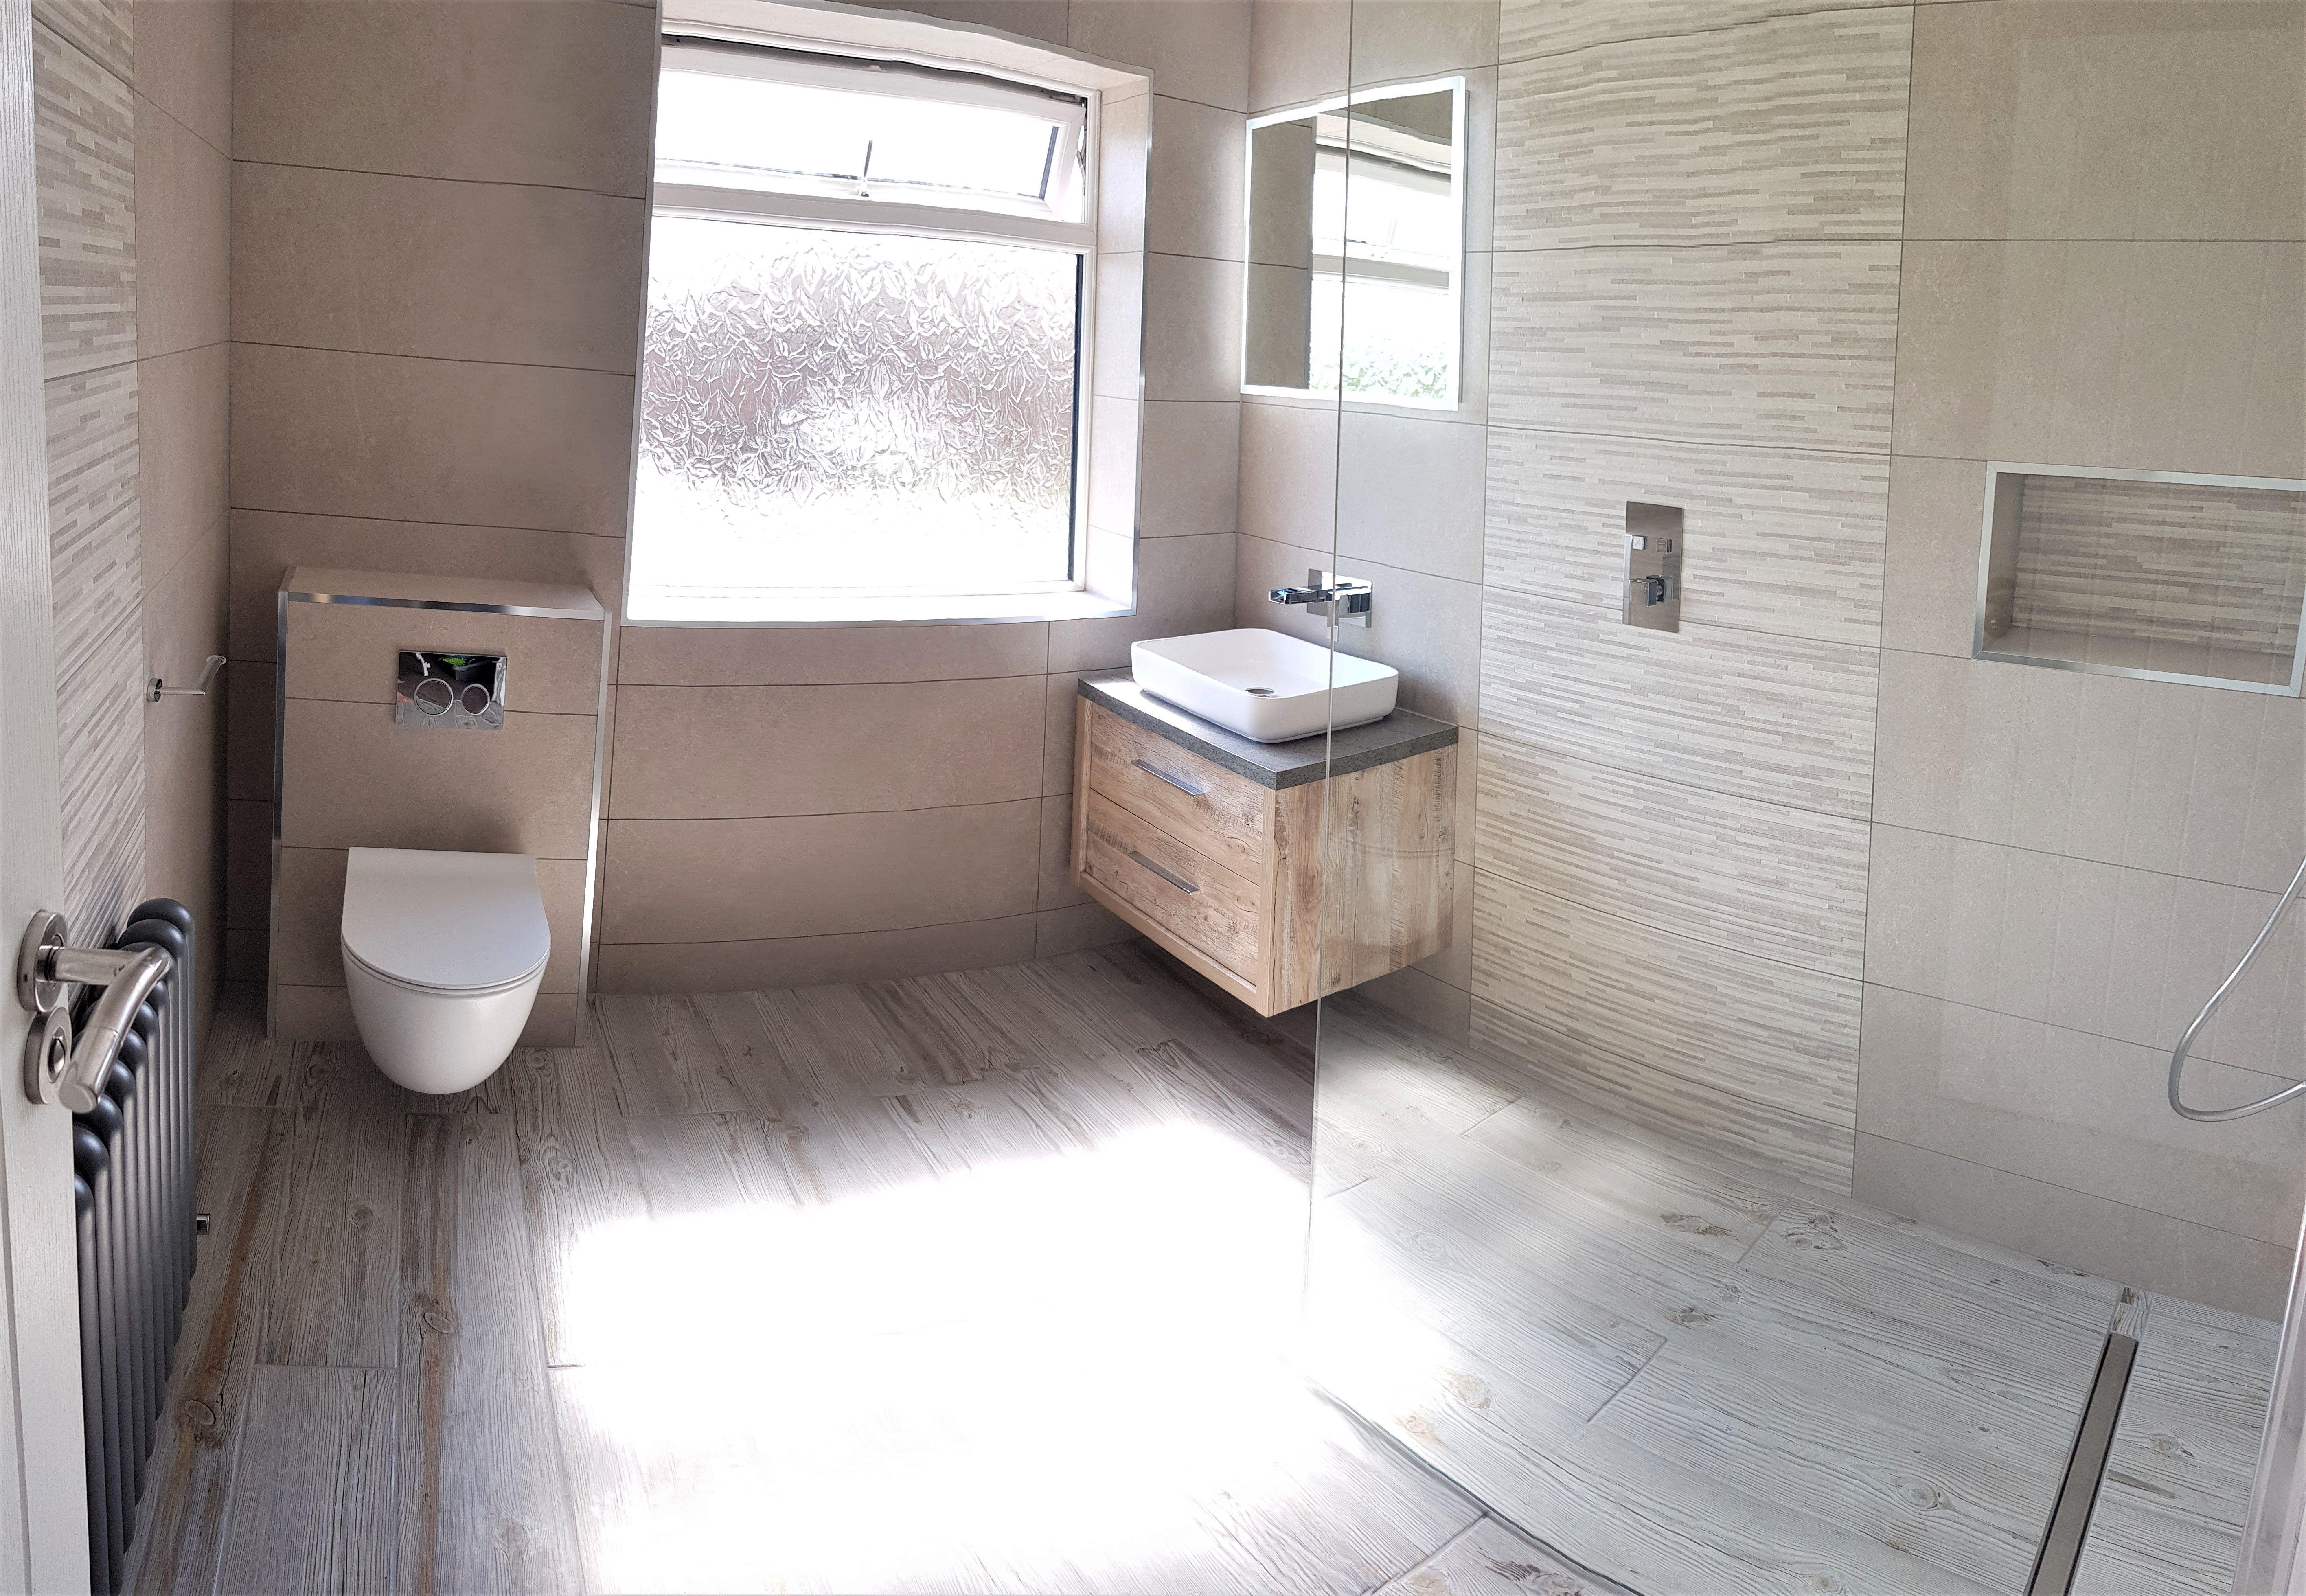 Mirfield Wet Room Wet Rooms Complete Bathroom Renovations Wall Hung Toilet